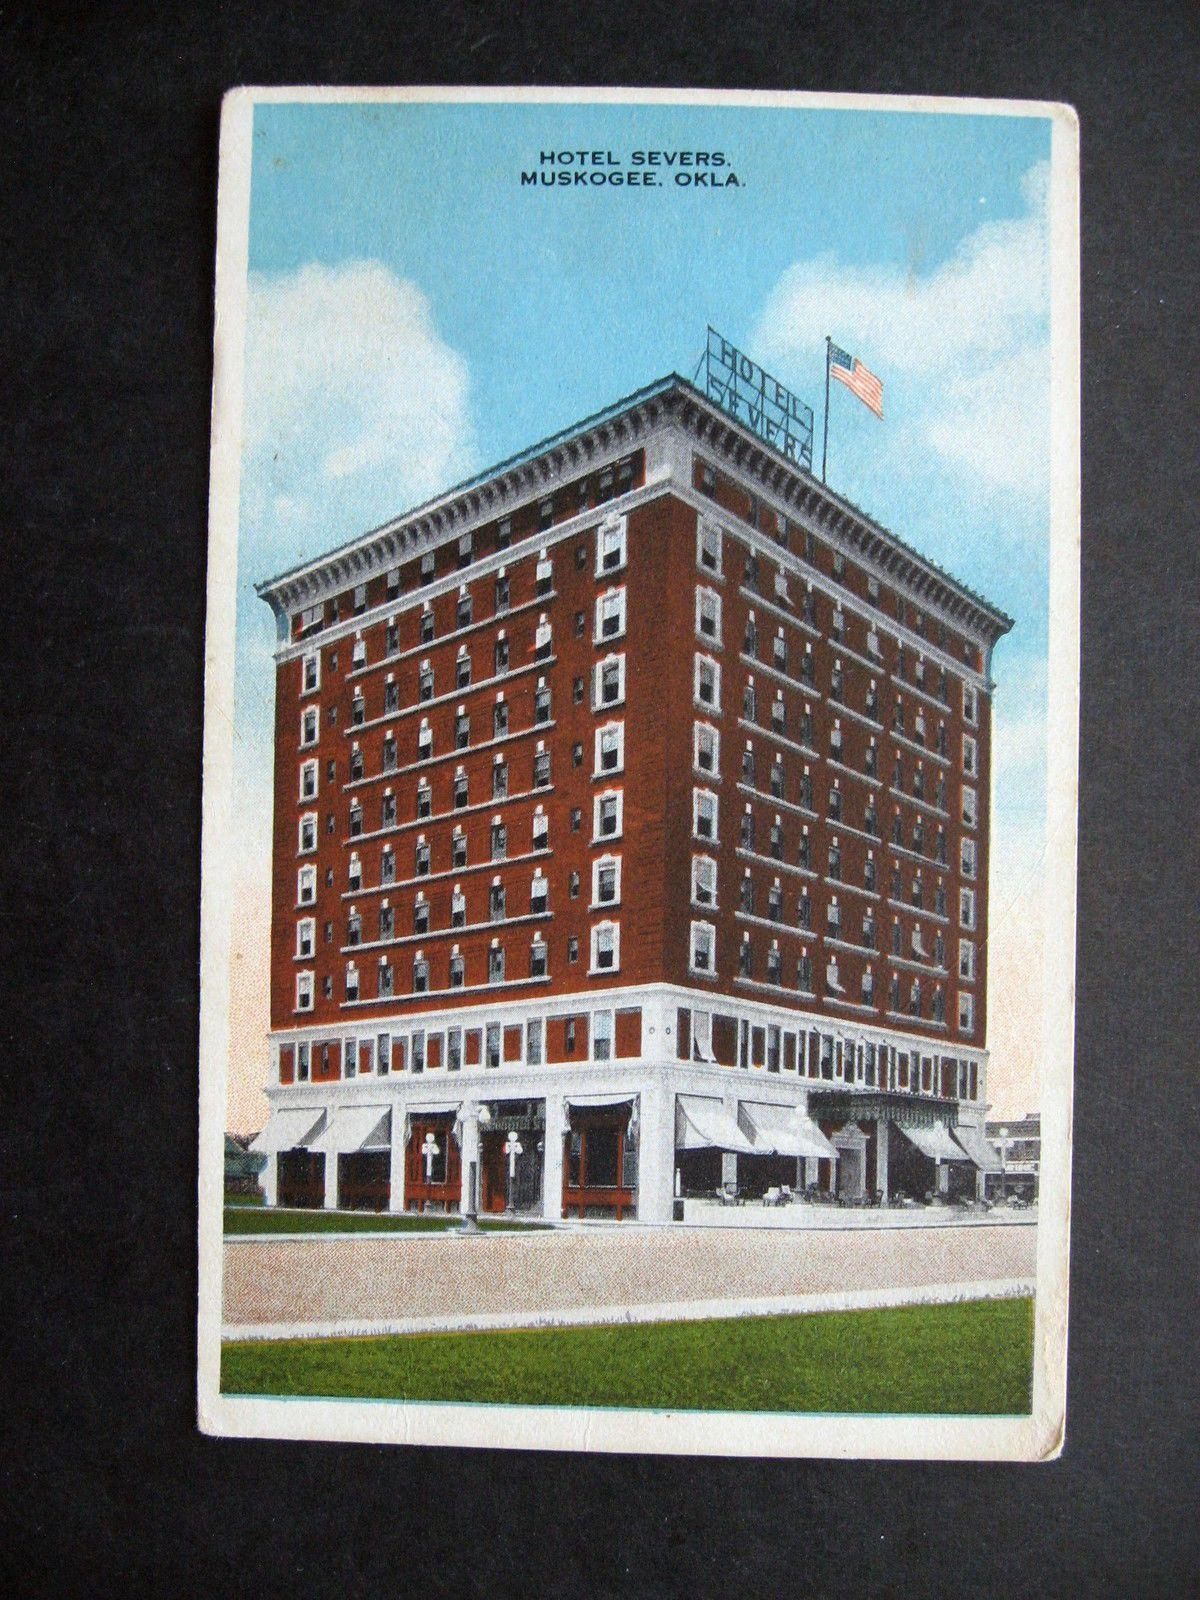 Ca1920 Muskogee Oklahoma Hotel Severs Postcard Ebay Muskogee Oklahoma Muskogee Postcard